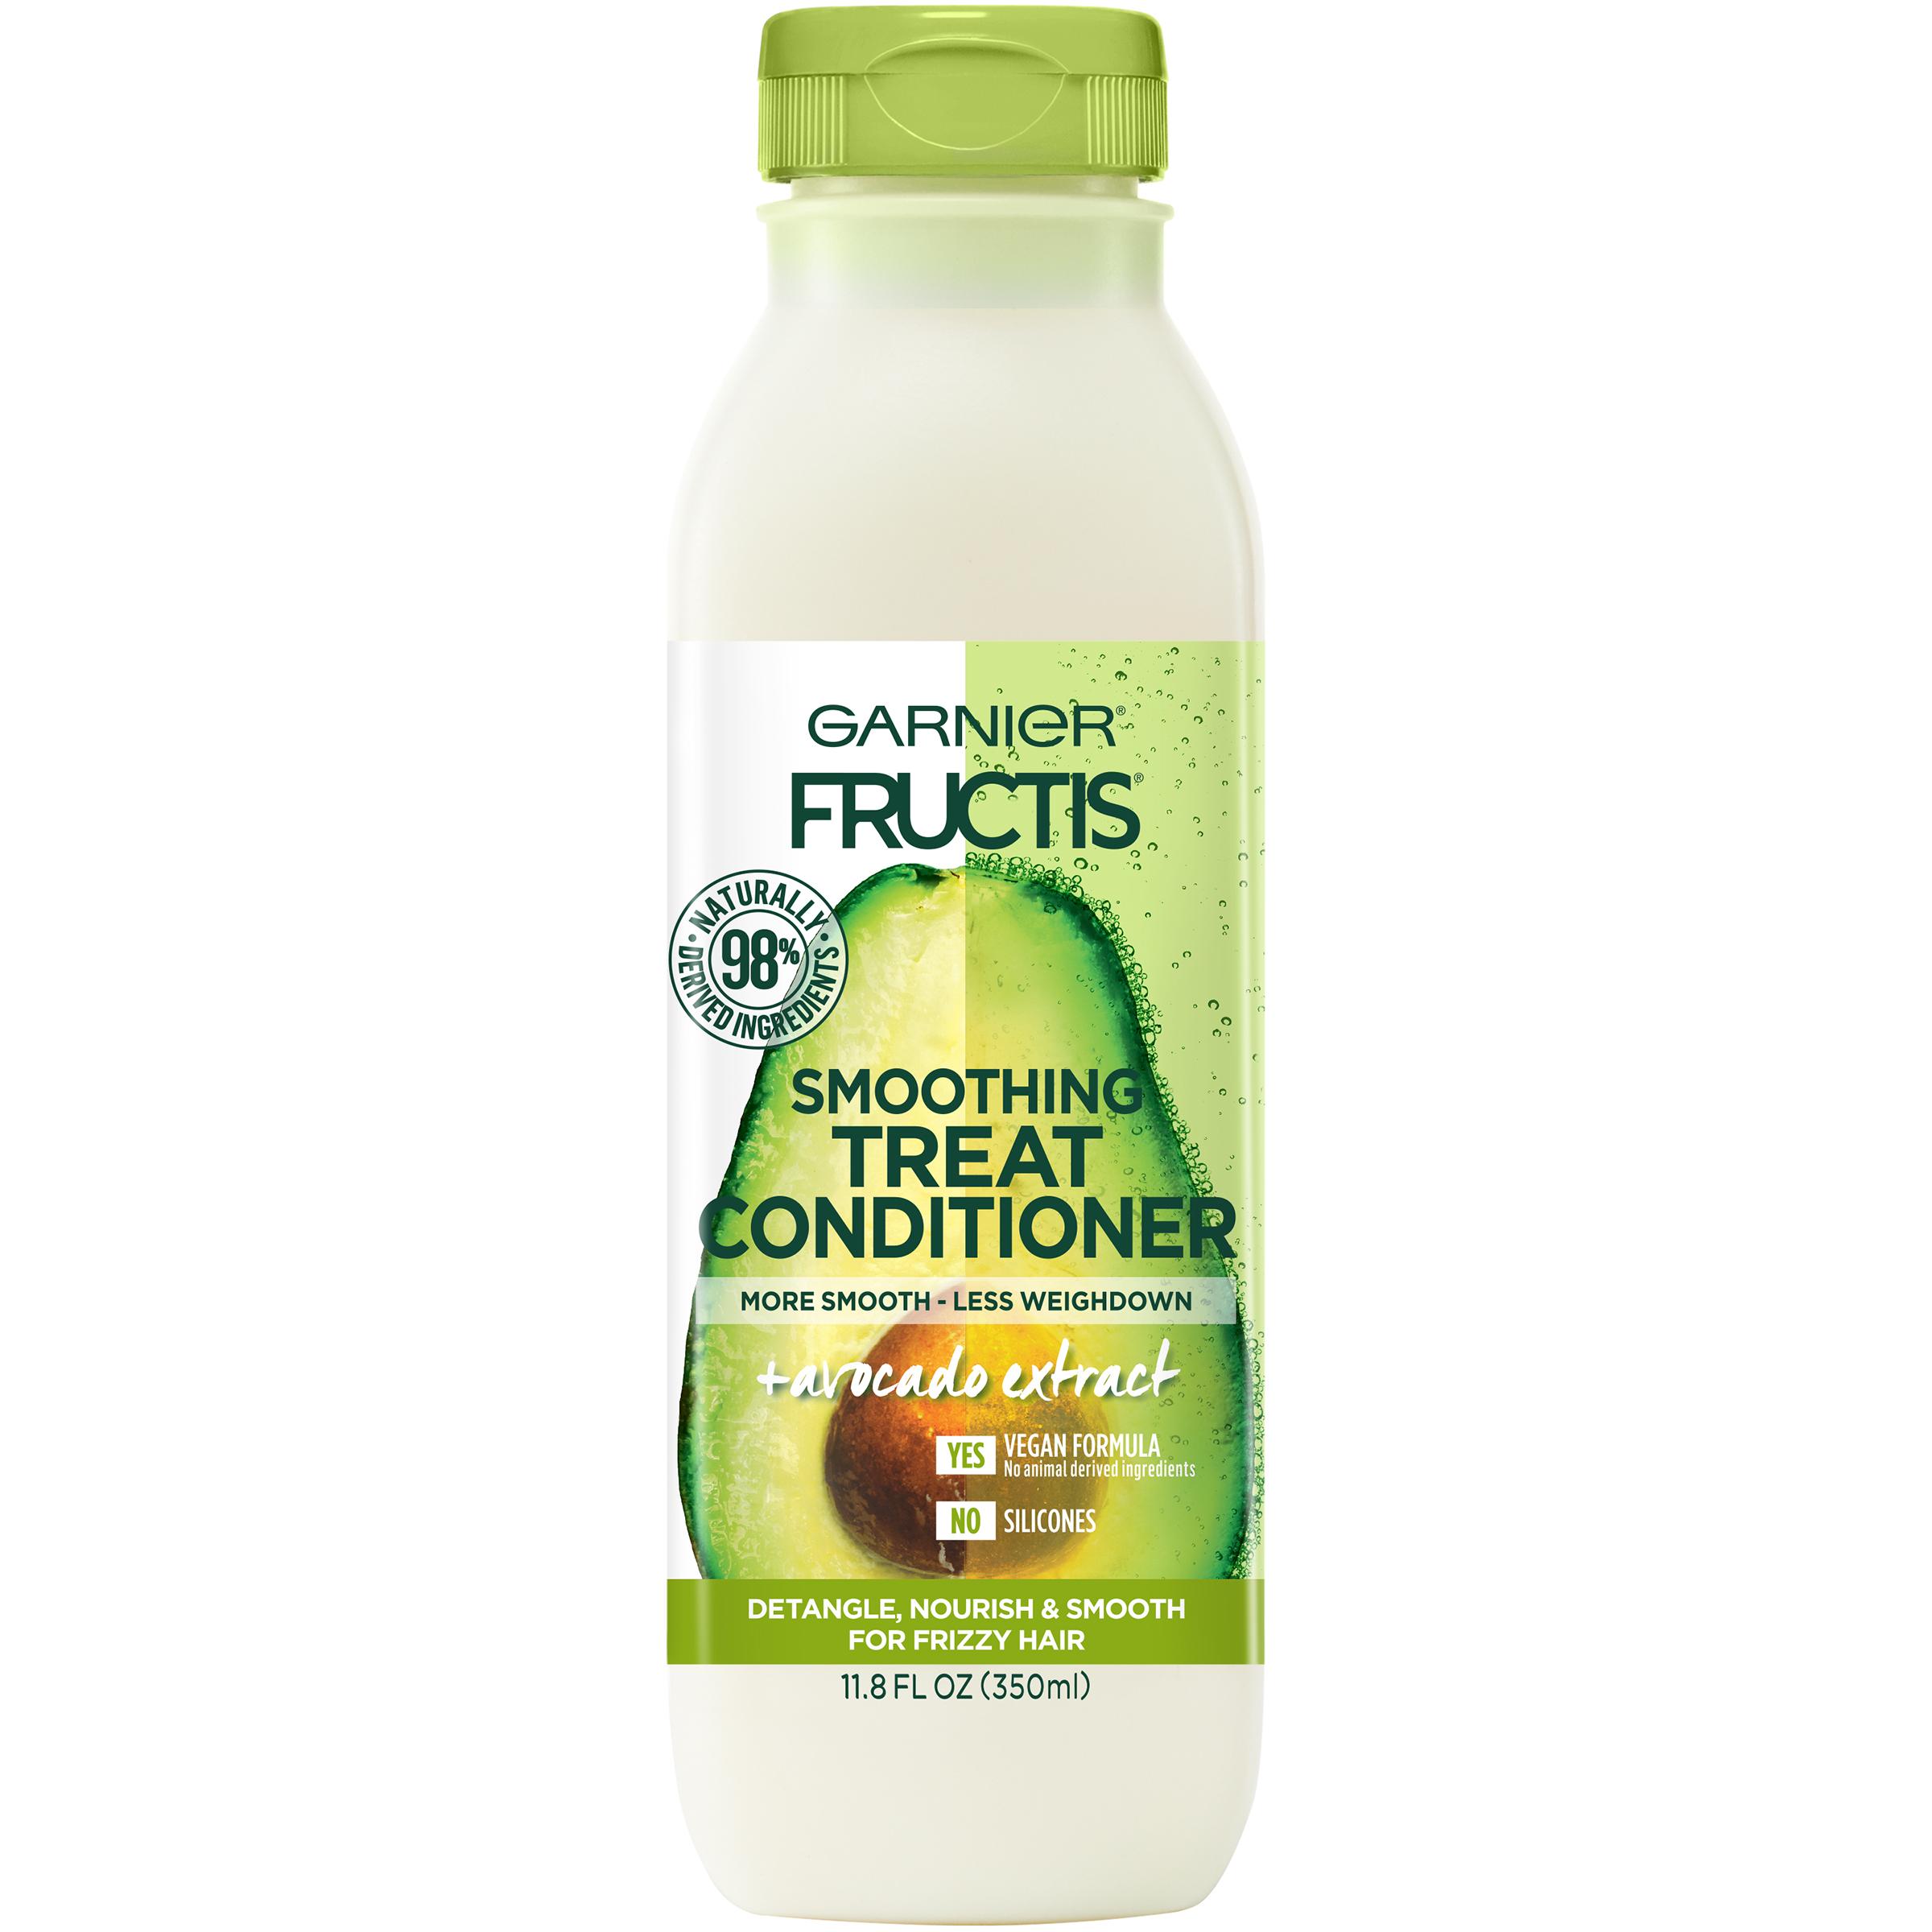 Save $2/1 Garnier Fructis Treat Shampoo, Conditioner or 1 Minute Hair Mask